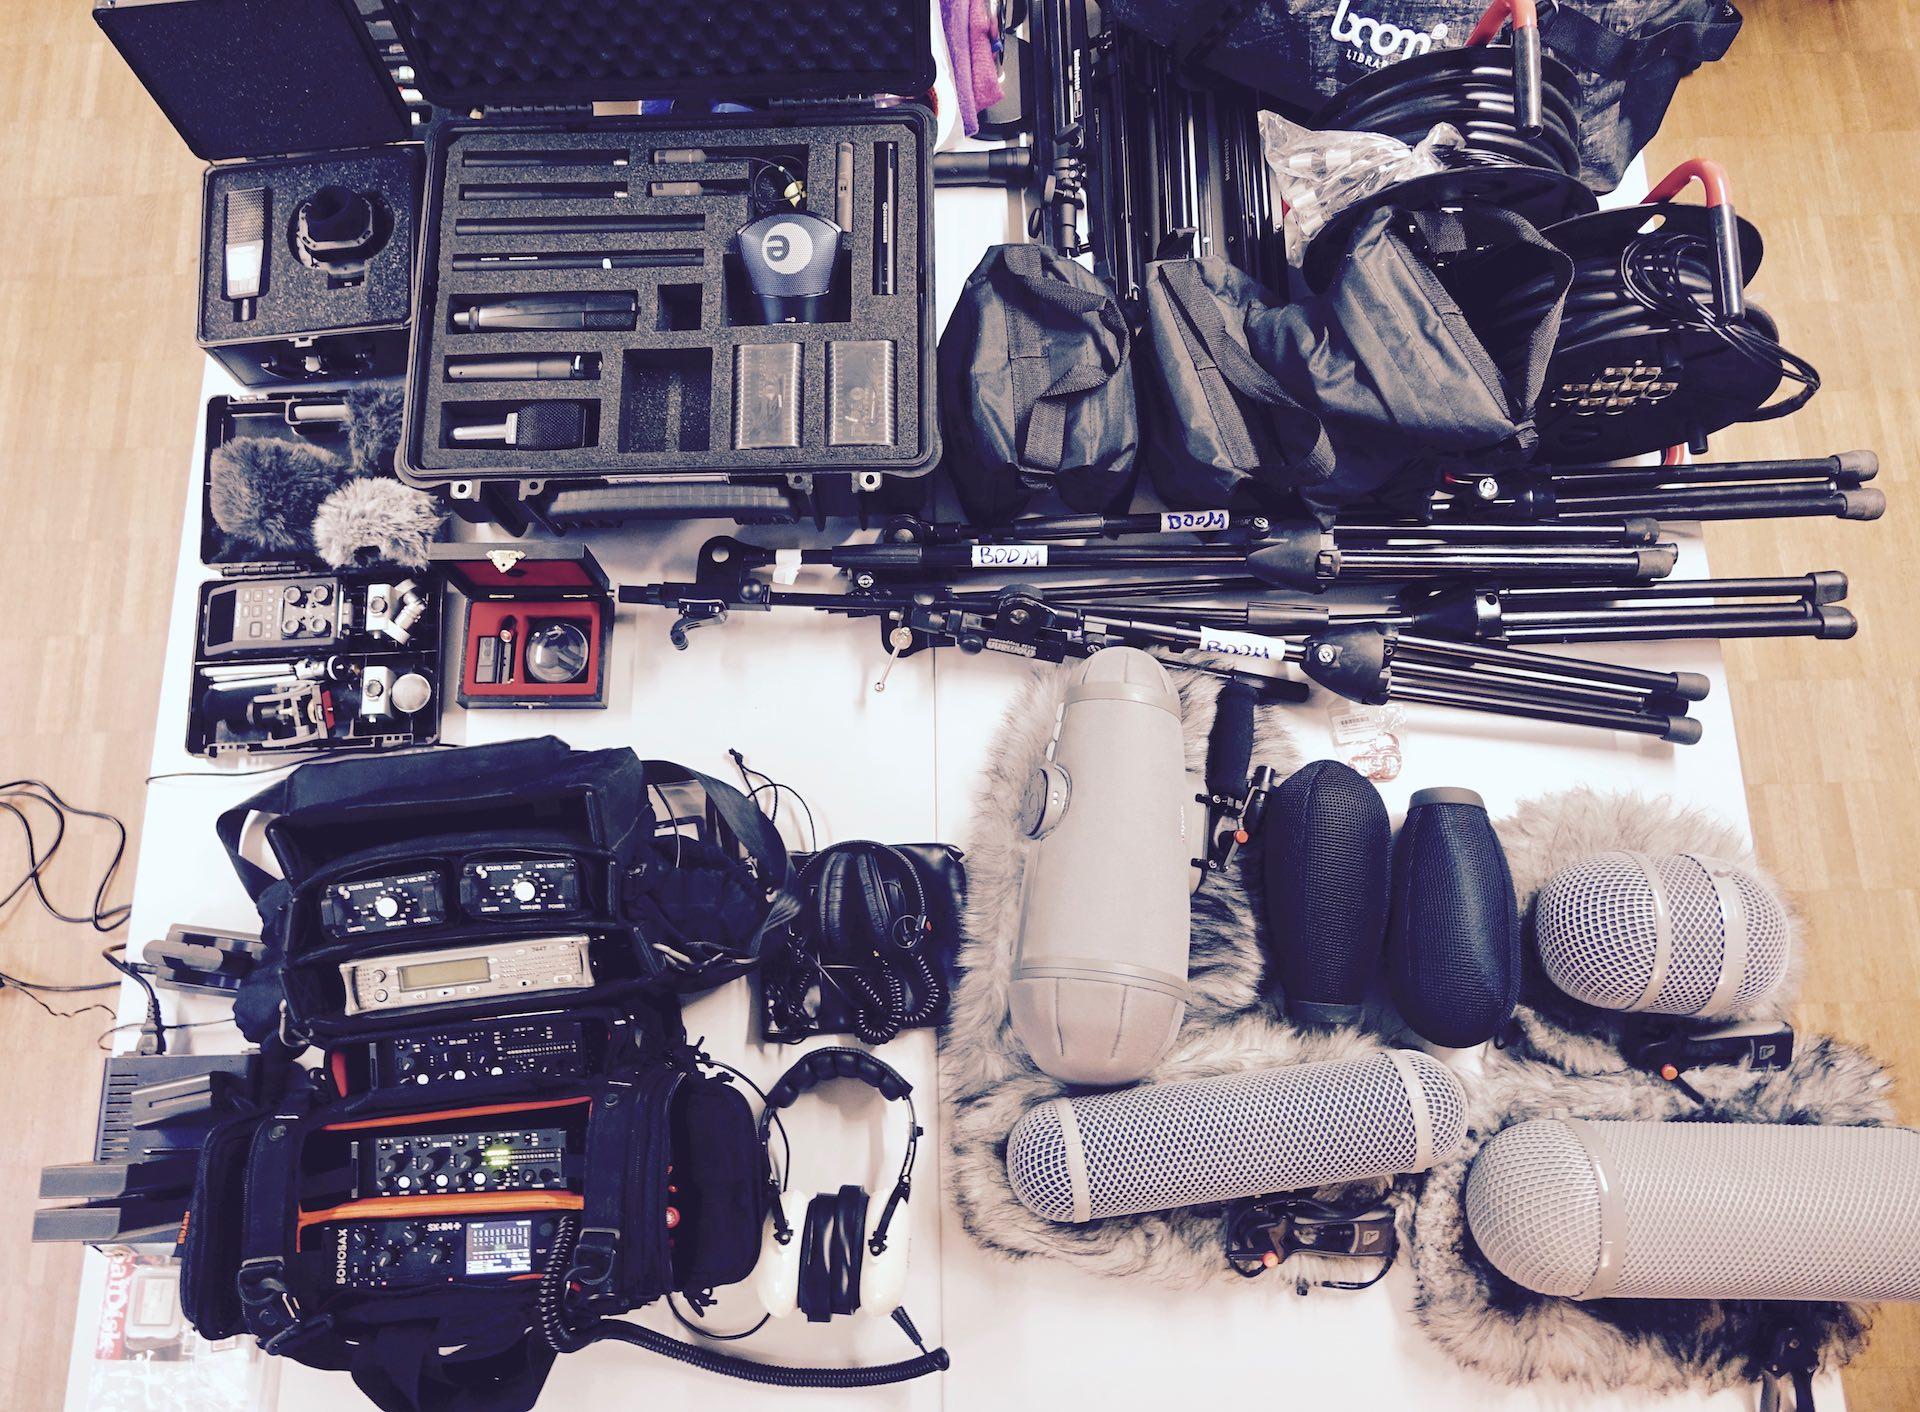 BOOM LIBRARY DAW : Field Recording Equipment Walk Through